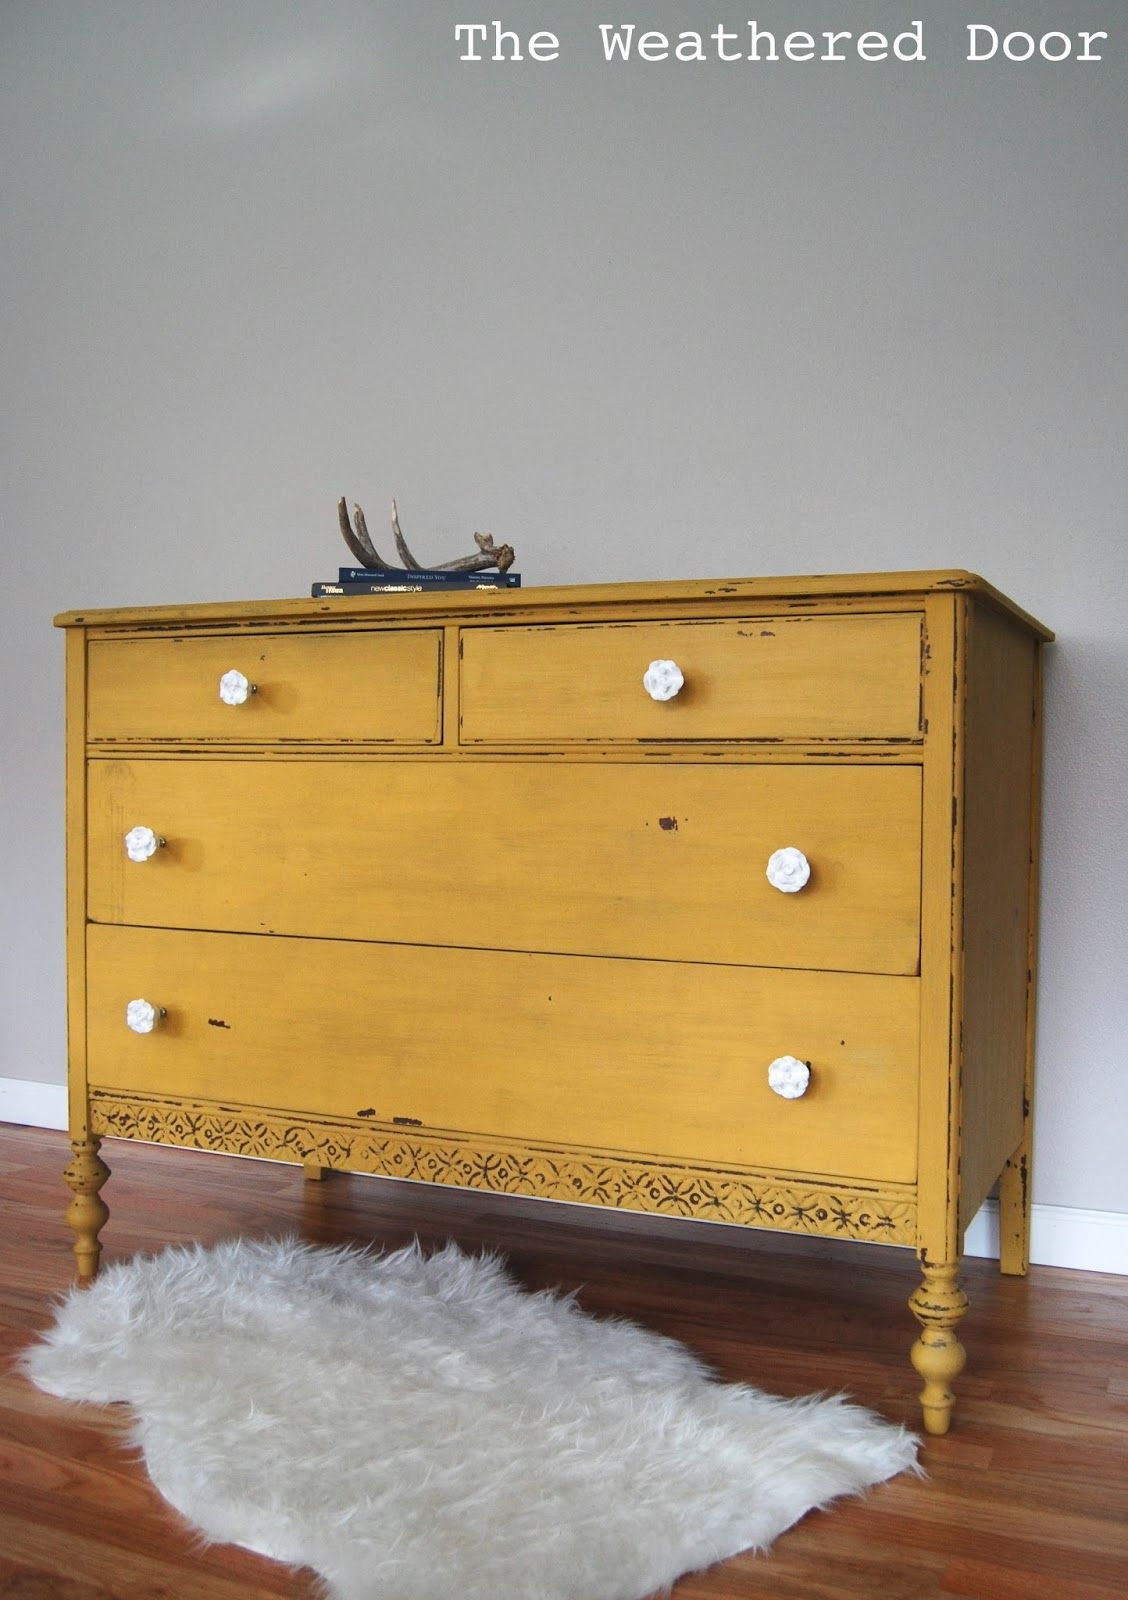 A chippy, mustard yellow dresser - 215.4KB